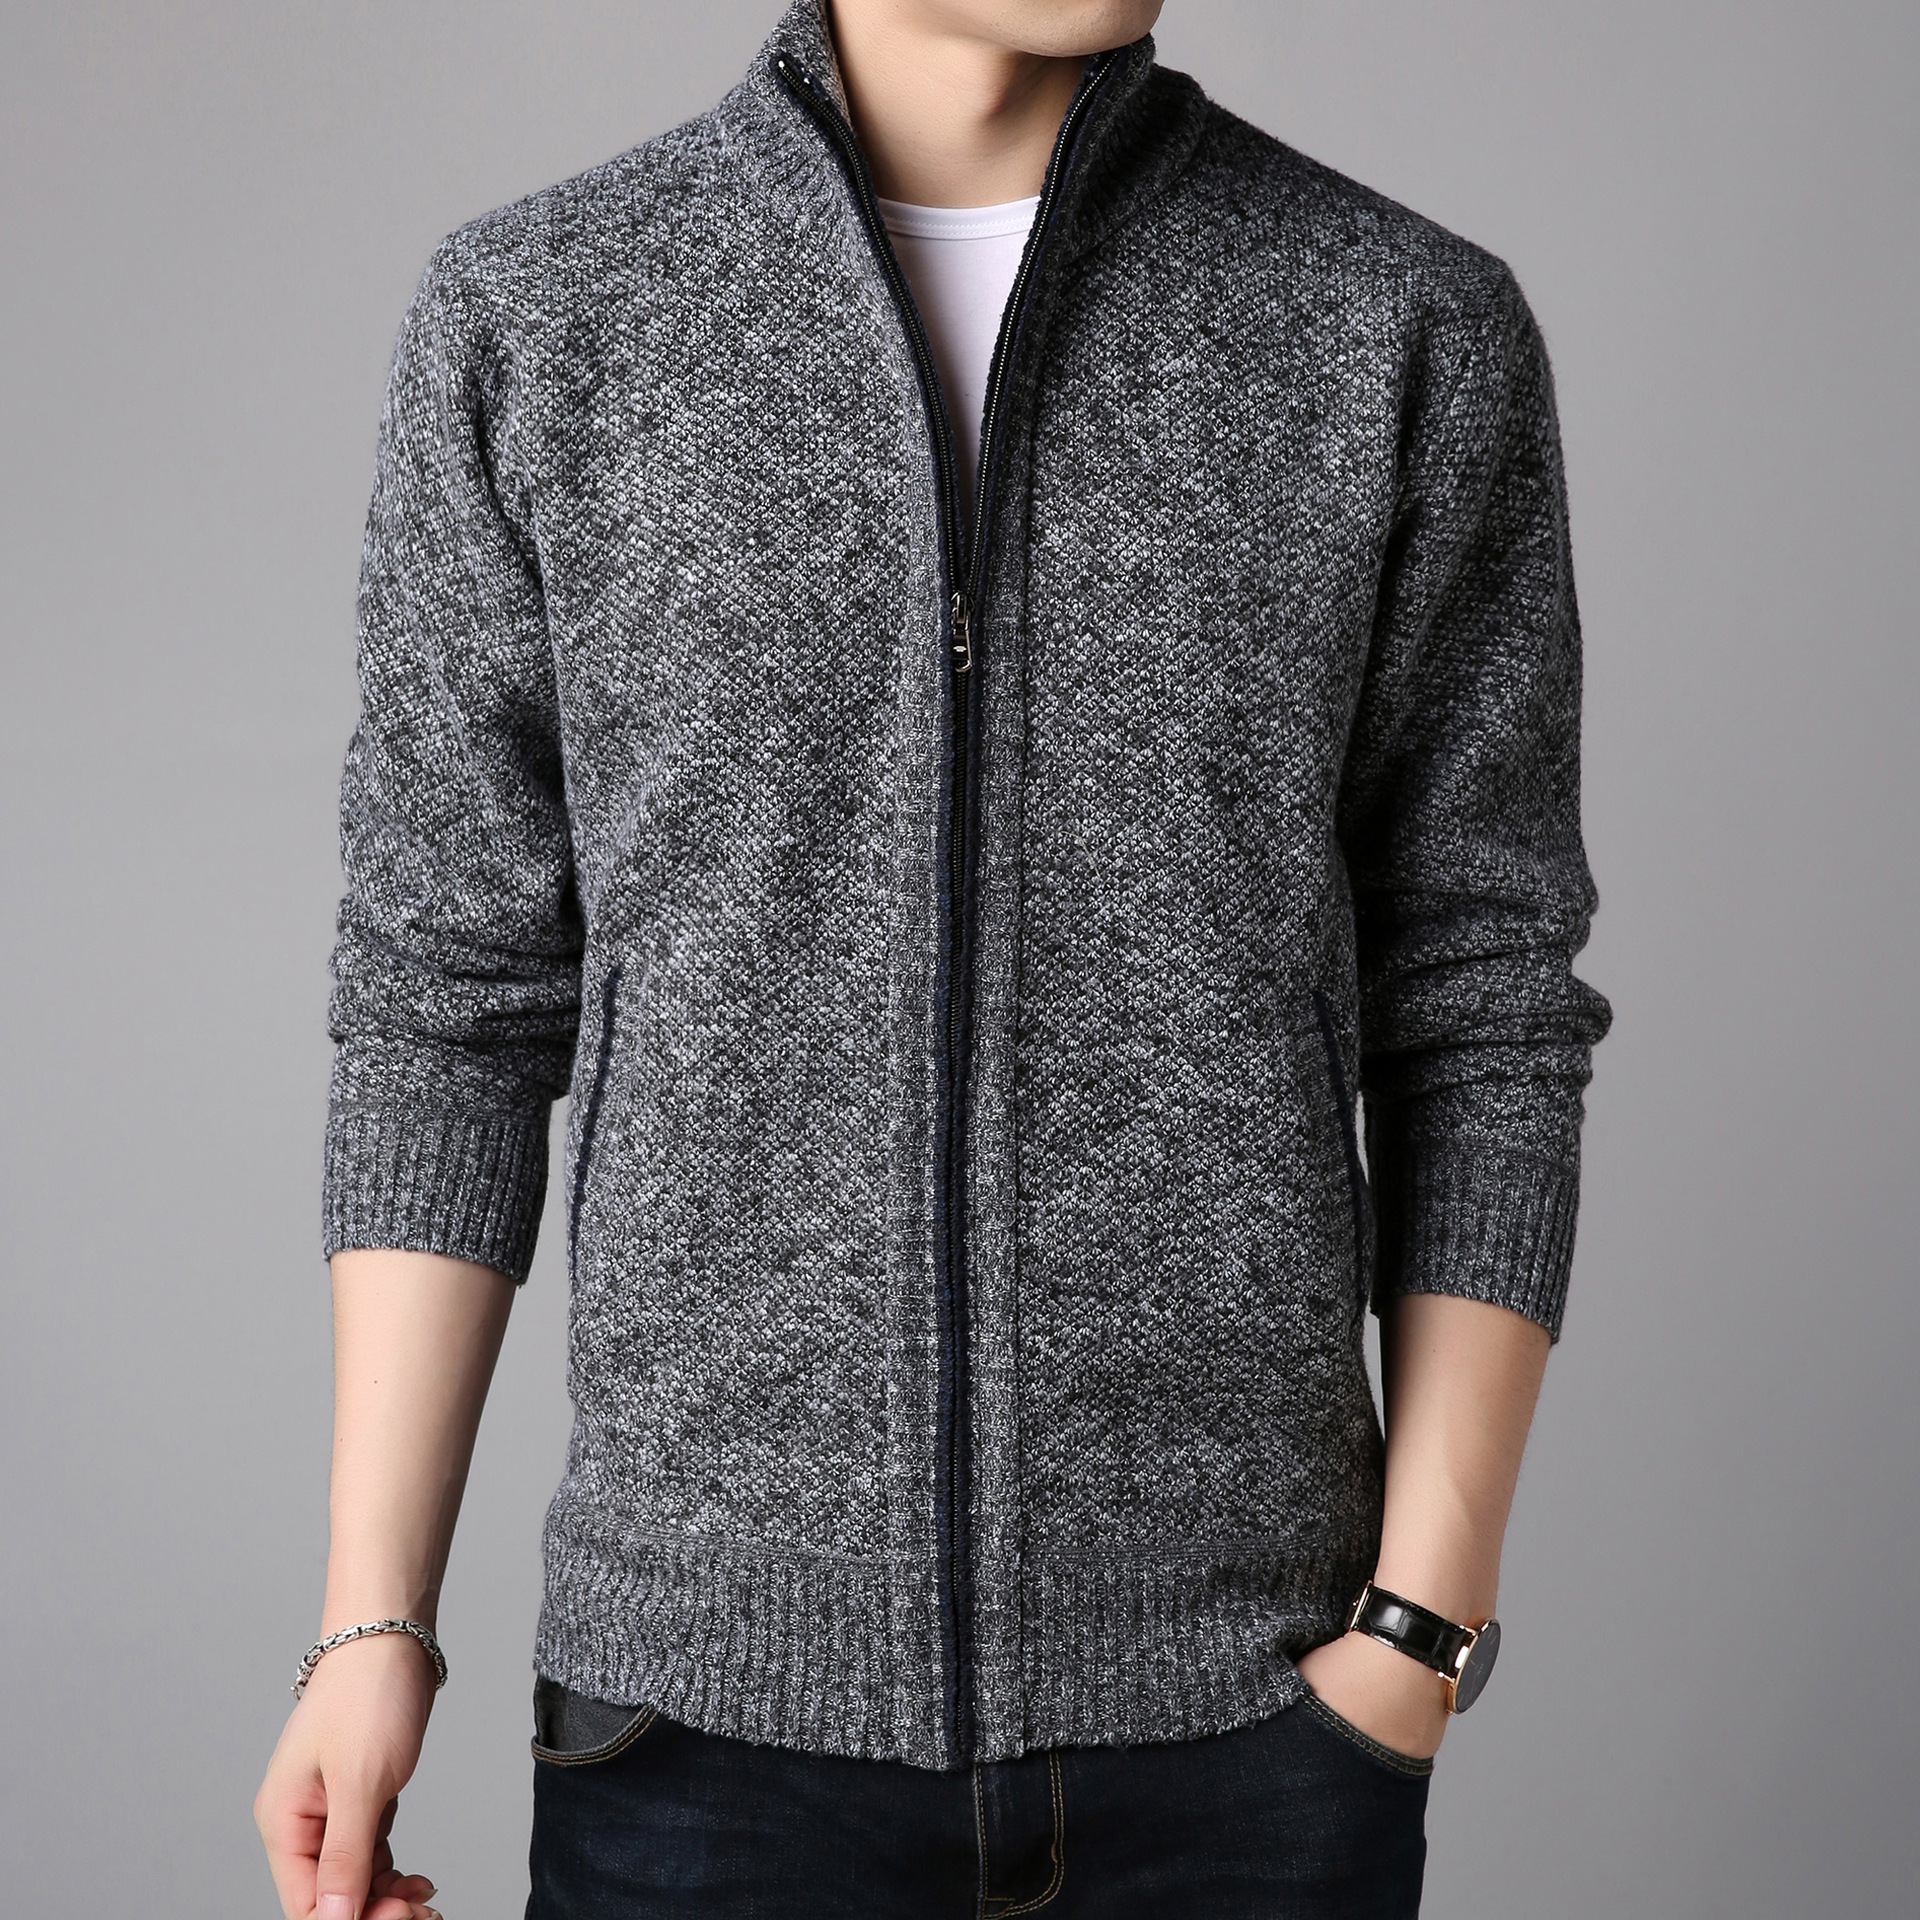 Winter Fleece Men's Sweater Coat Side Pocket Long Sleeve Knitted Cardigan Full Zip Autumn Warm Male Fashionable Causal Clothing